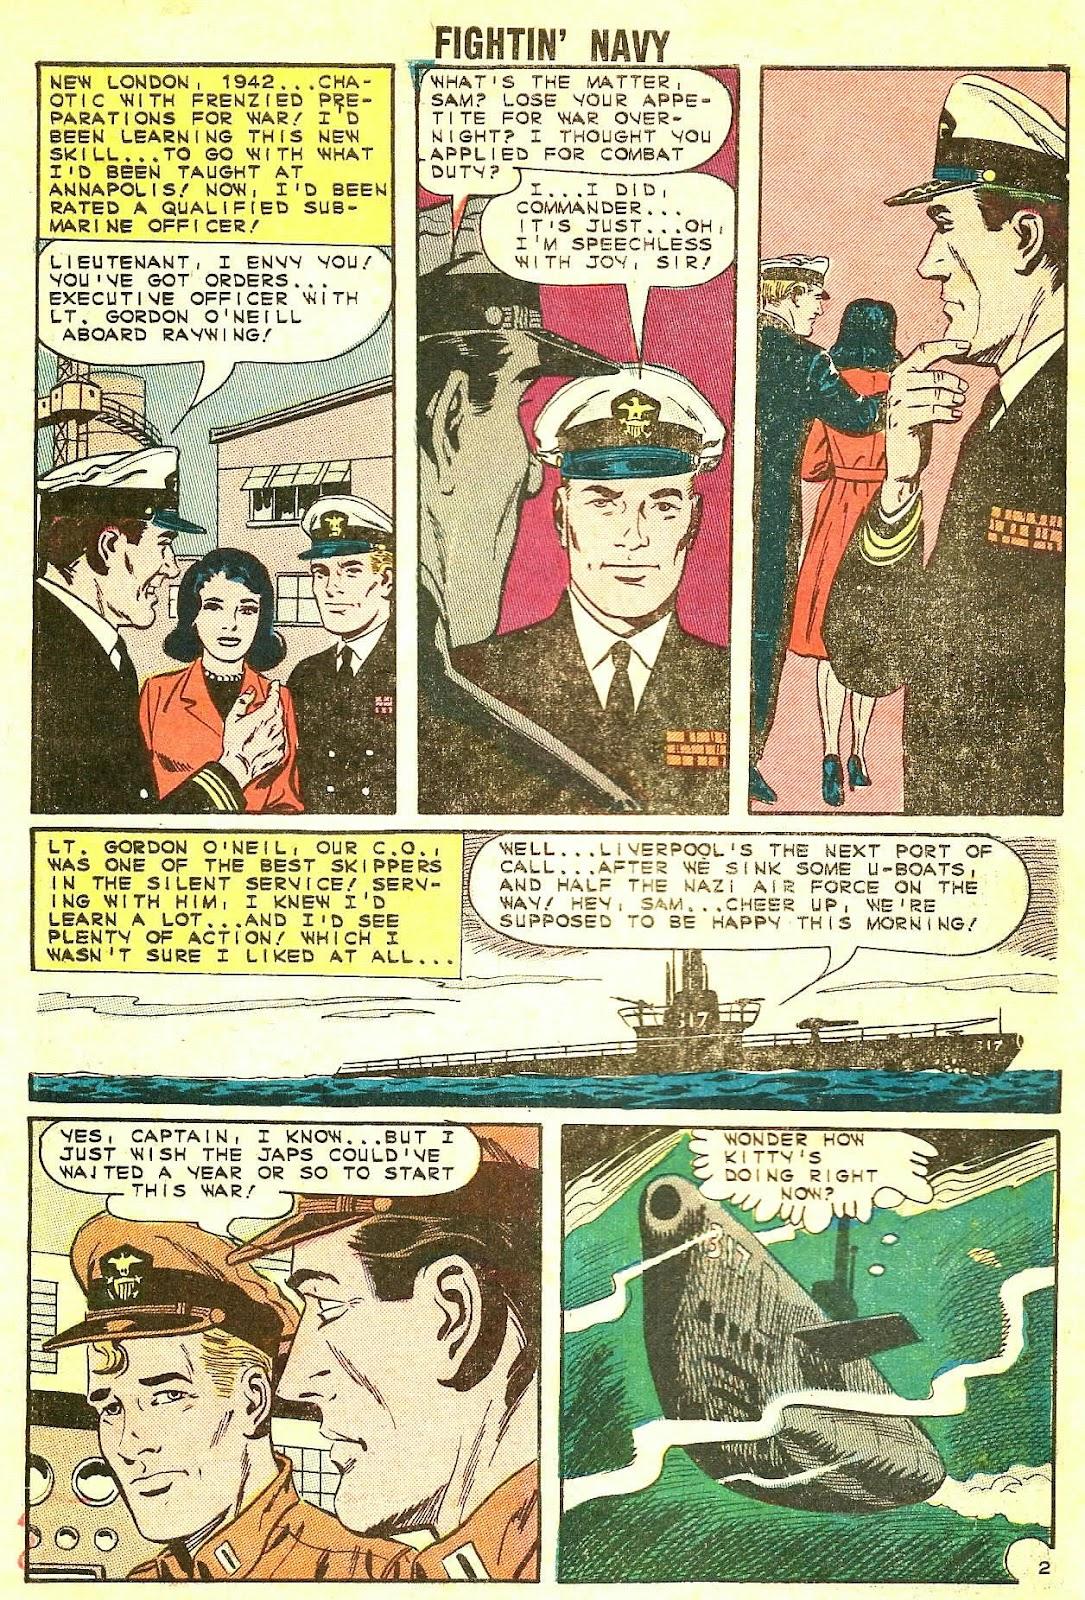 Read online Fightin' Navy comic -  Issue #115 - 10